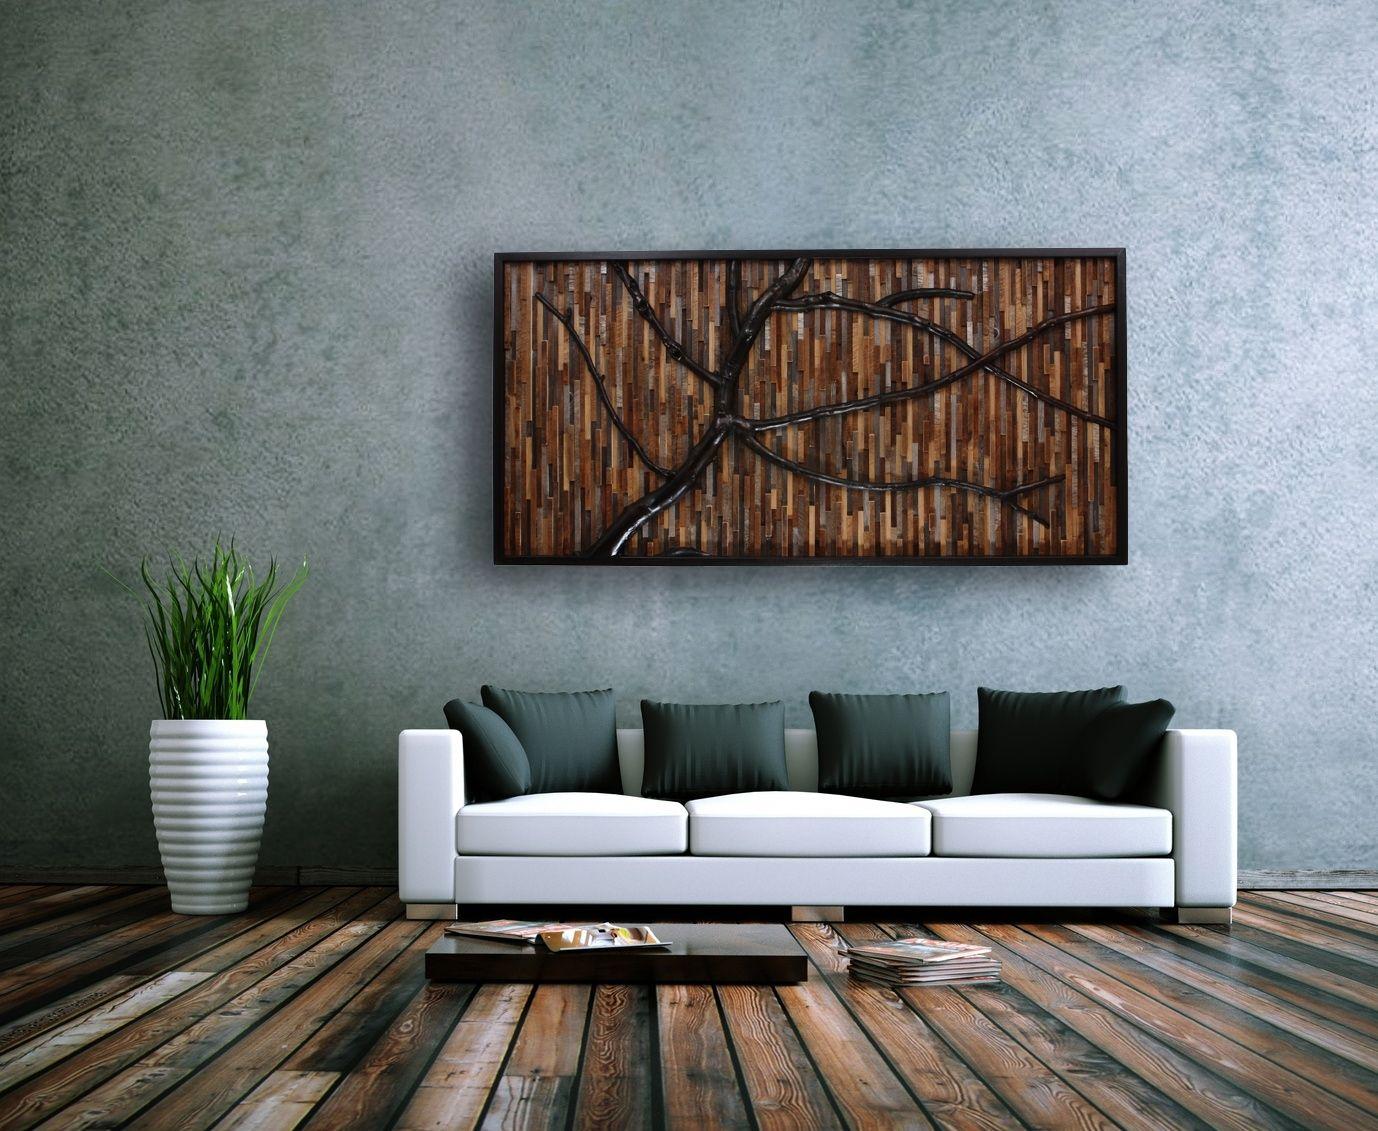 Custom Wood Wall Decor : Hand crafted reclaimed wood wall art that evokes a wind